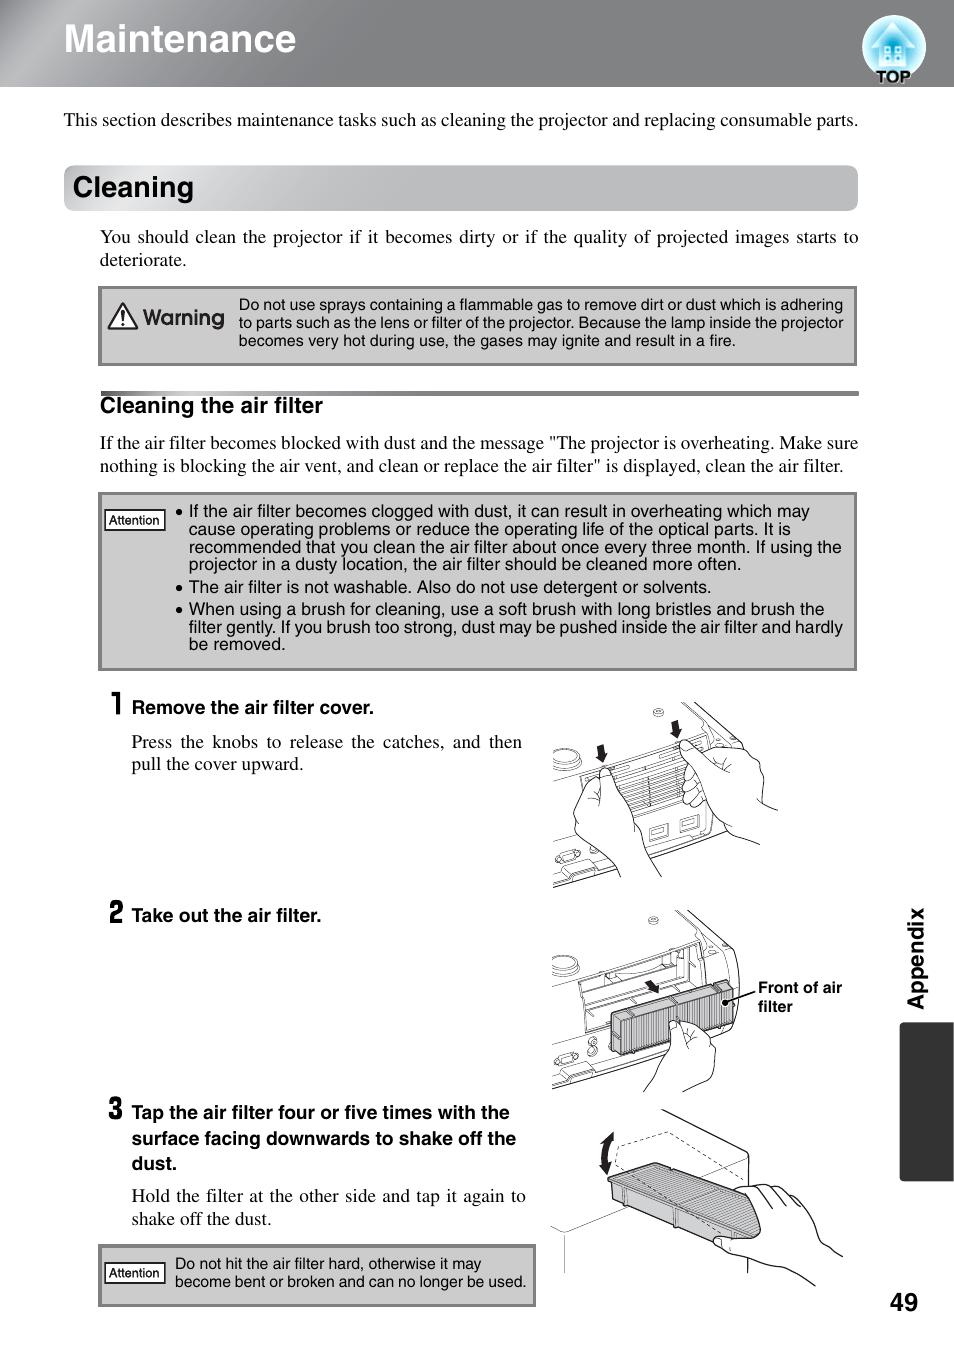 epson eh-tw3500 manual